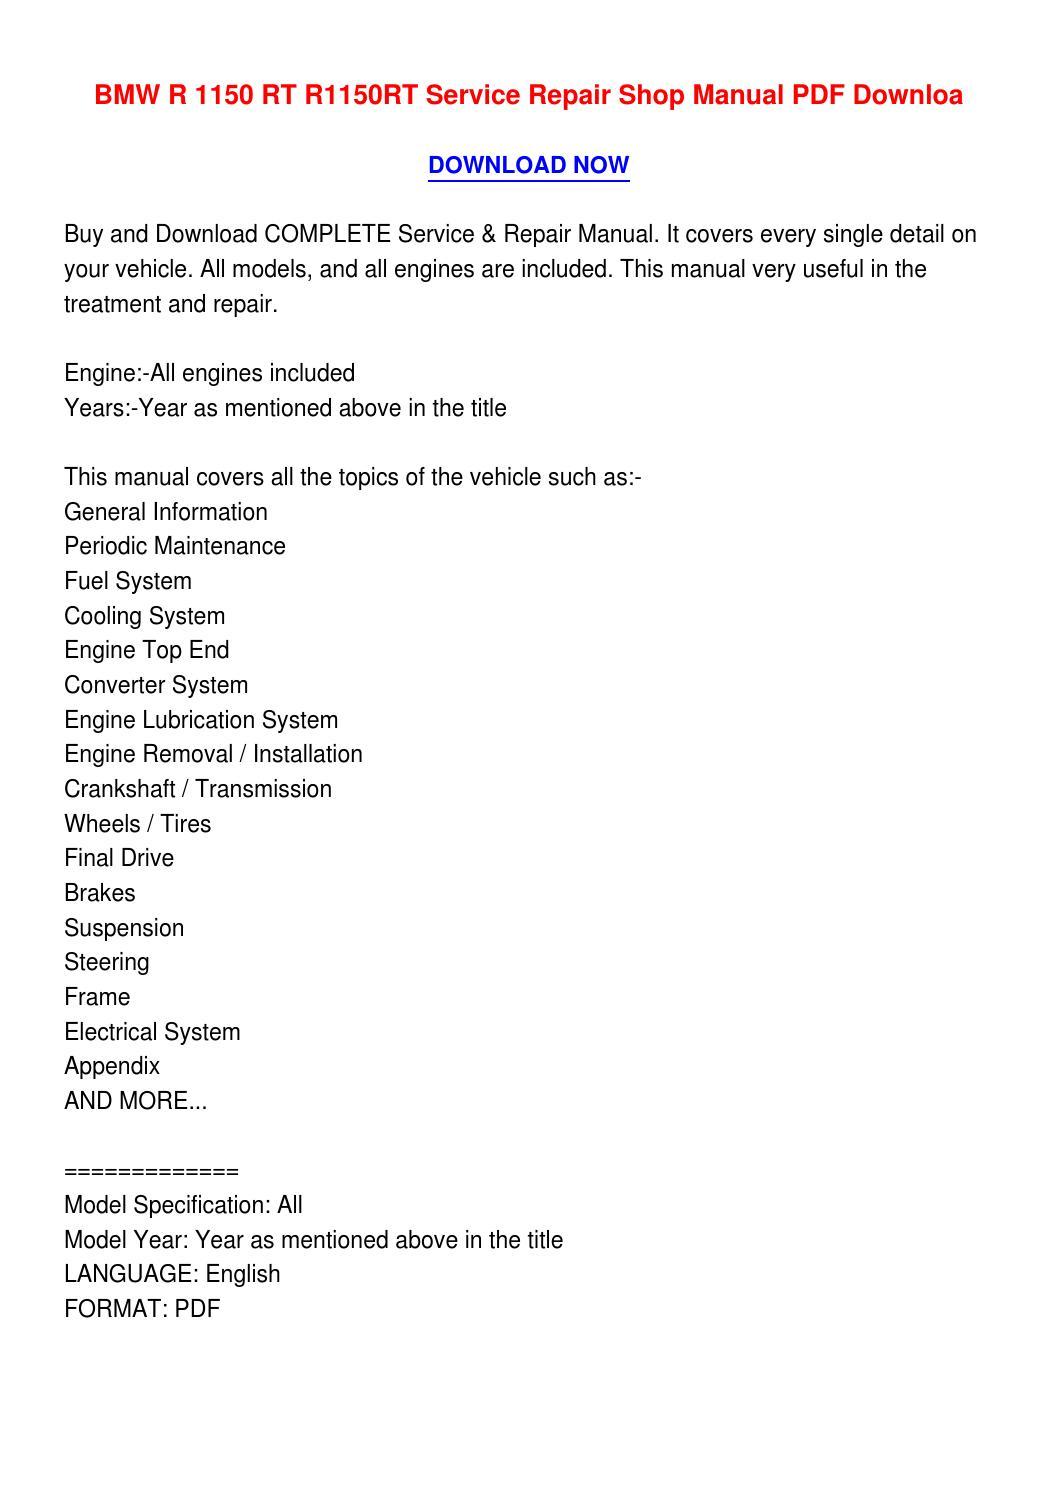 Bmw r 1150 rt r1150rt service repair shop manual pdf downloa4 by  norbertzornittadlzjr - issuu